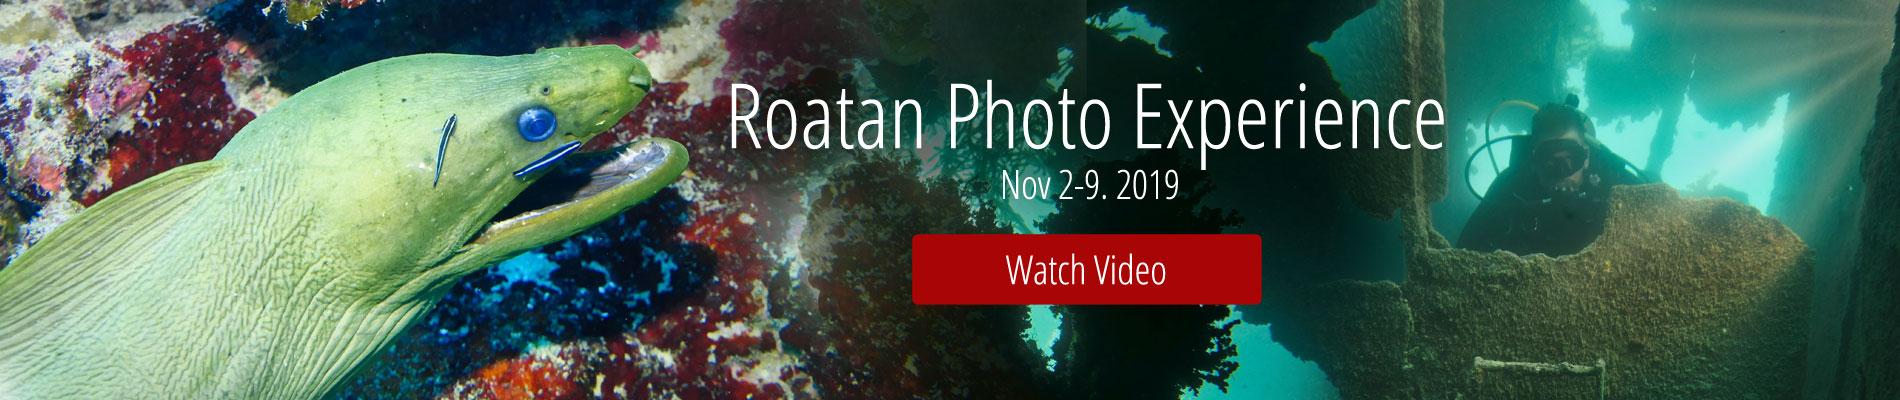 Roatan Photo Experience Watch Video